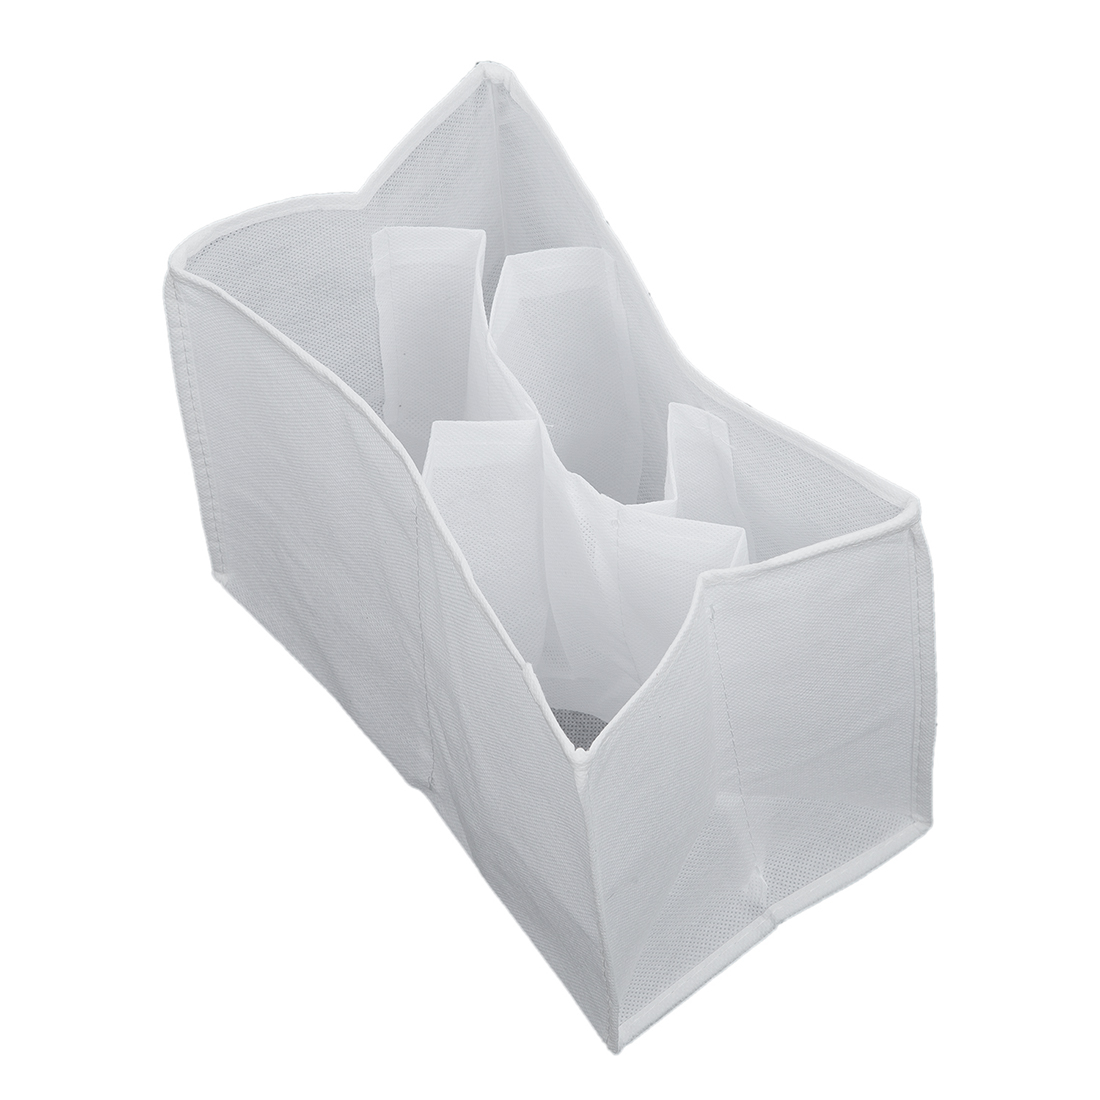 sac a langer bebe maman interieur couche range biberon securite voyage s ps ebay. Black Bedroom Furniture Sets. Home Design Ideas